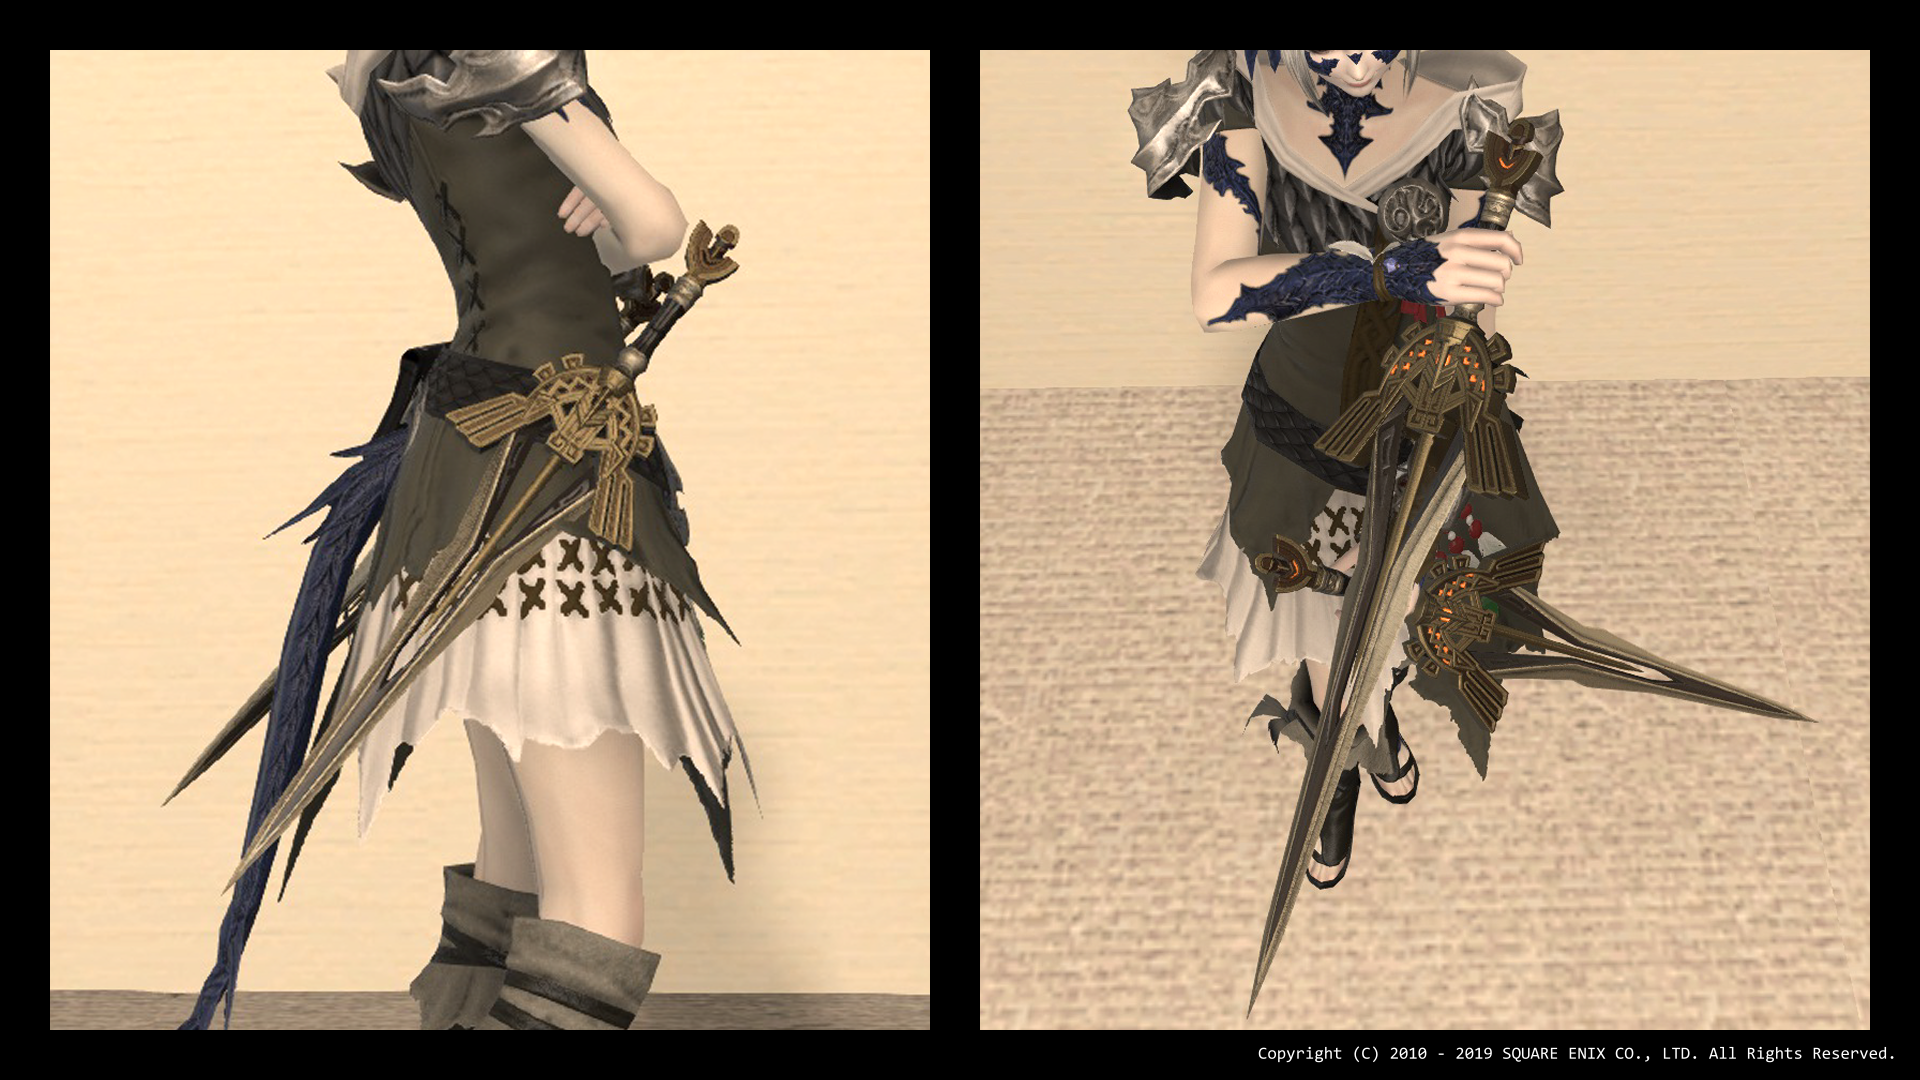 440-nin-arms